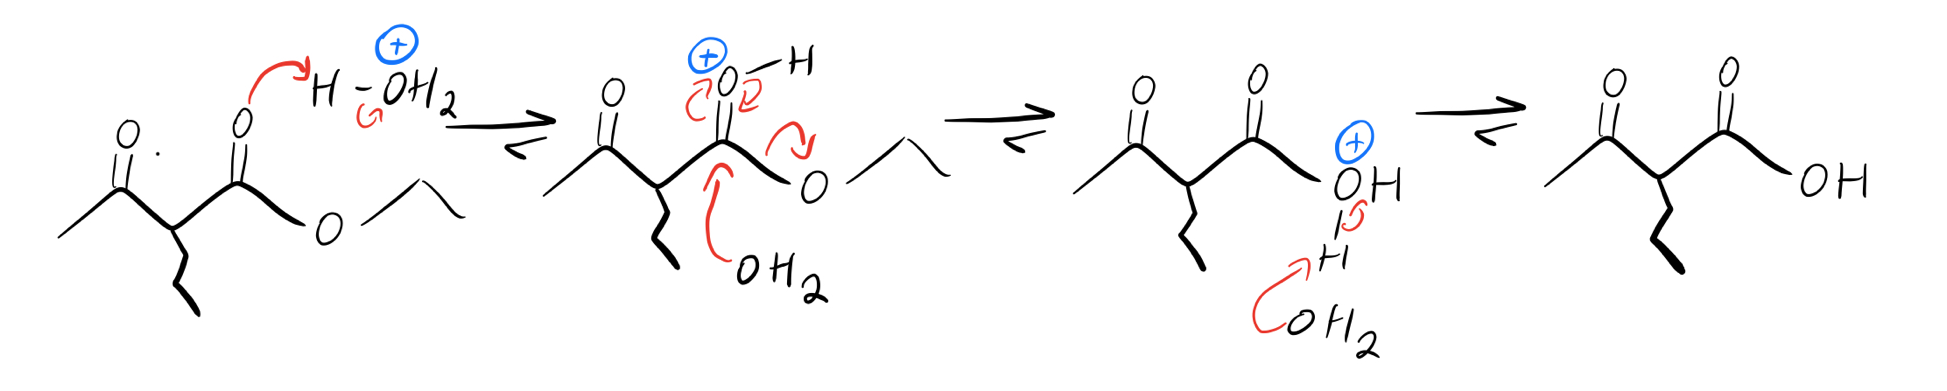 Acid-catalyzed-ester-hydrolysis